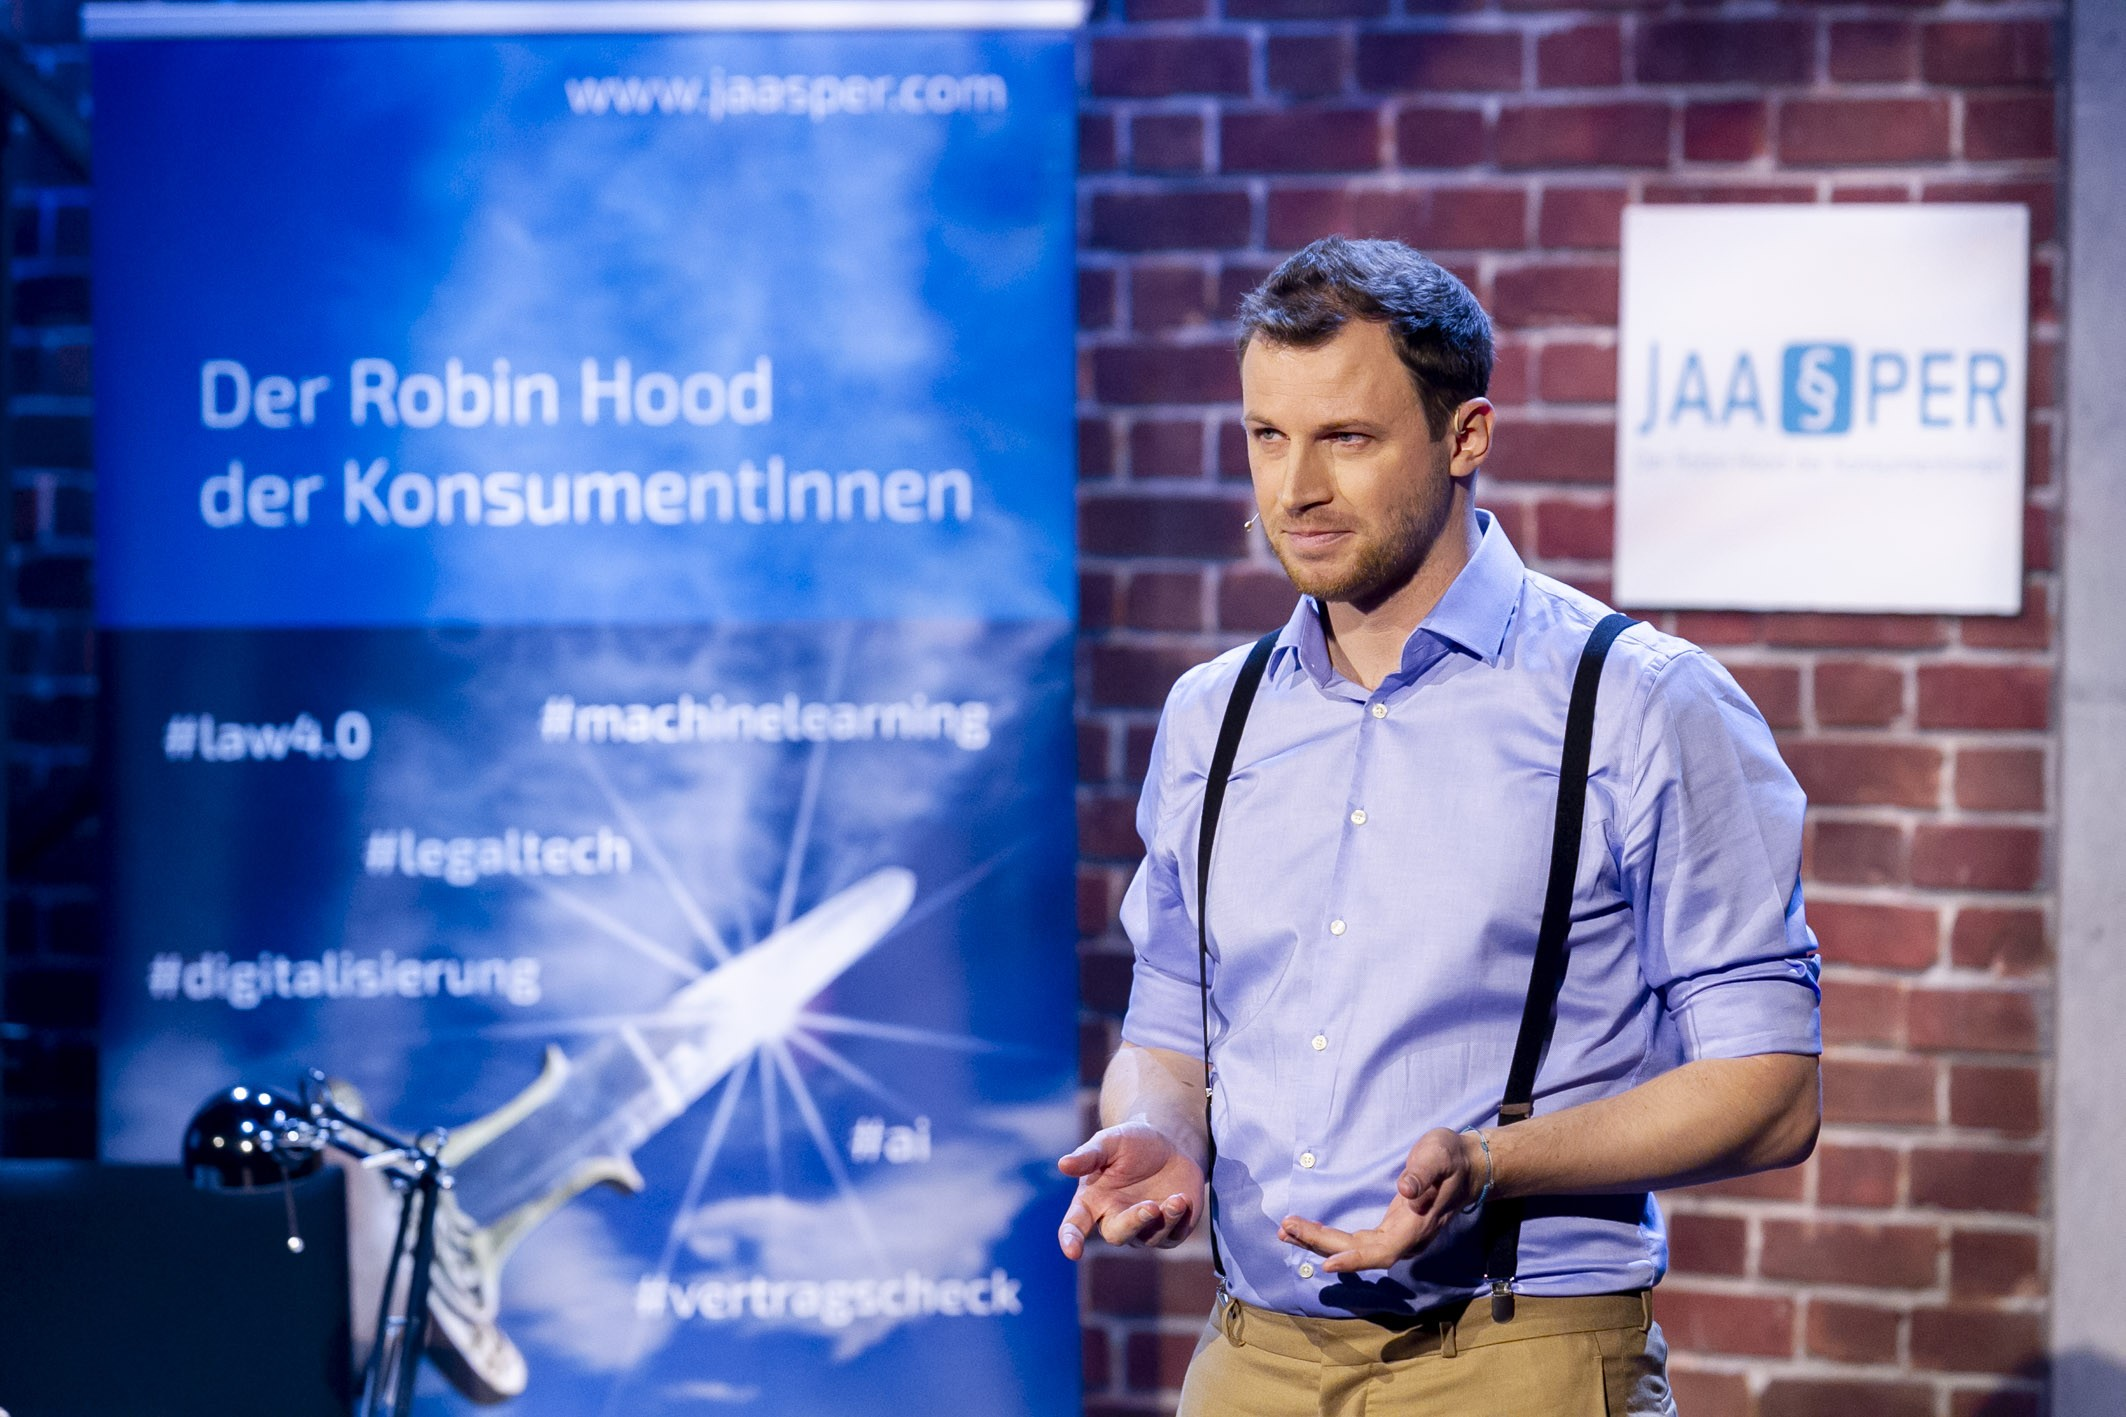 """2 Minuten 2 Millionen"" Martin Rohla. Katharina Schneider, Leo Hilinger, Hans Peter Haselsteiner, Florian Gschwandtner"